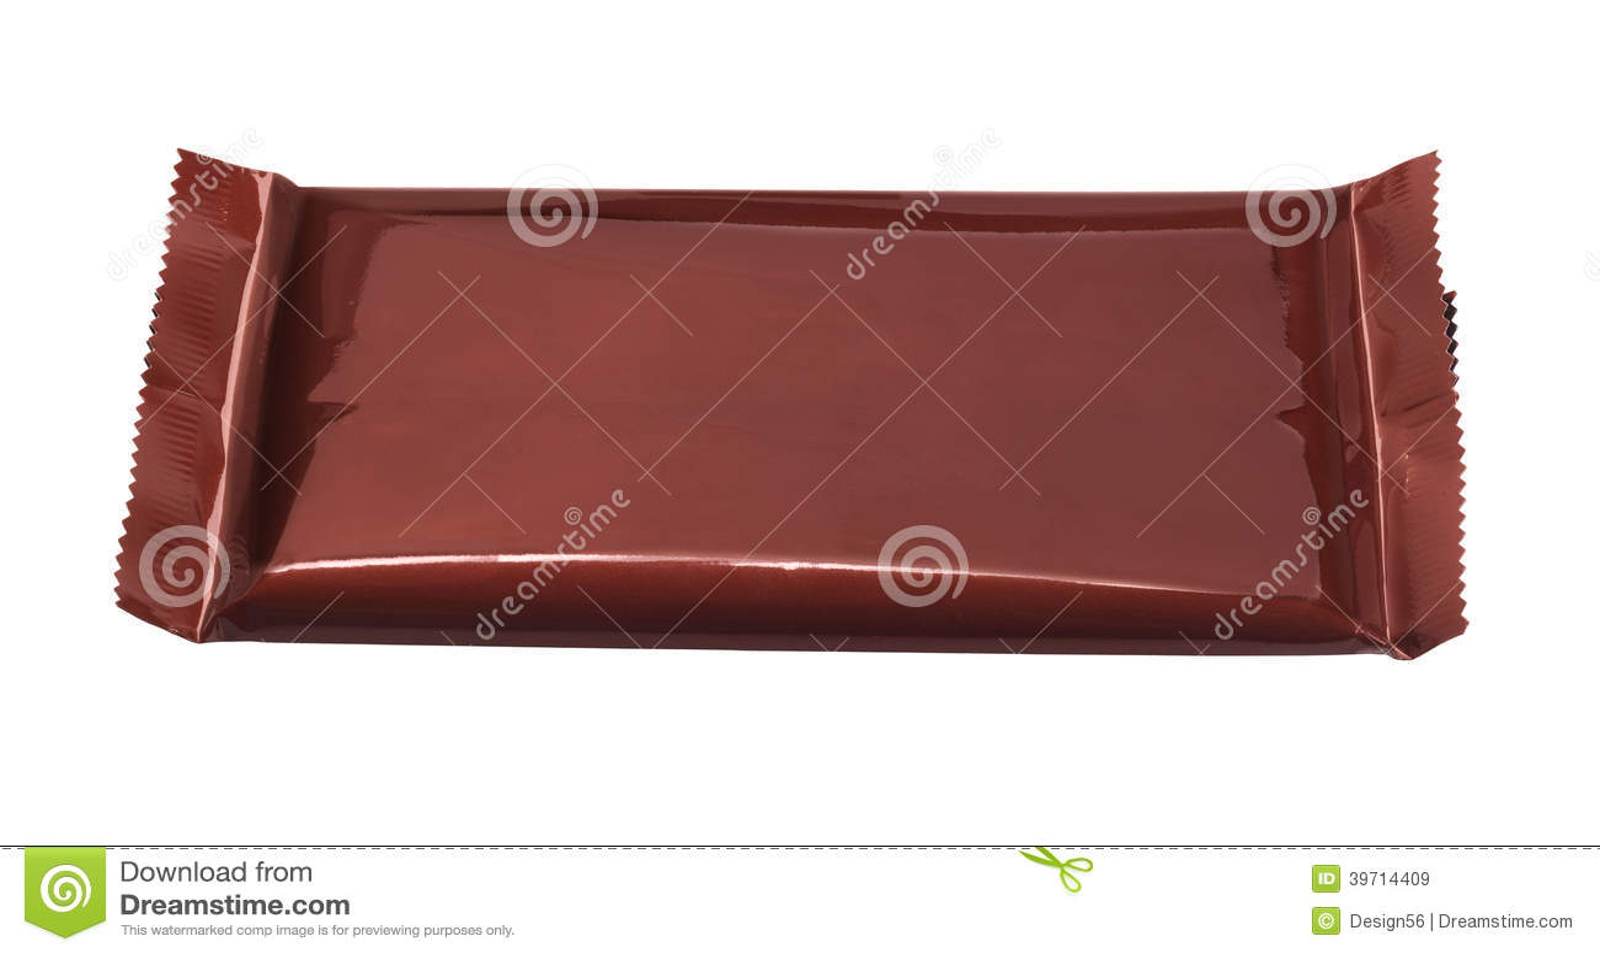 choclate wraper